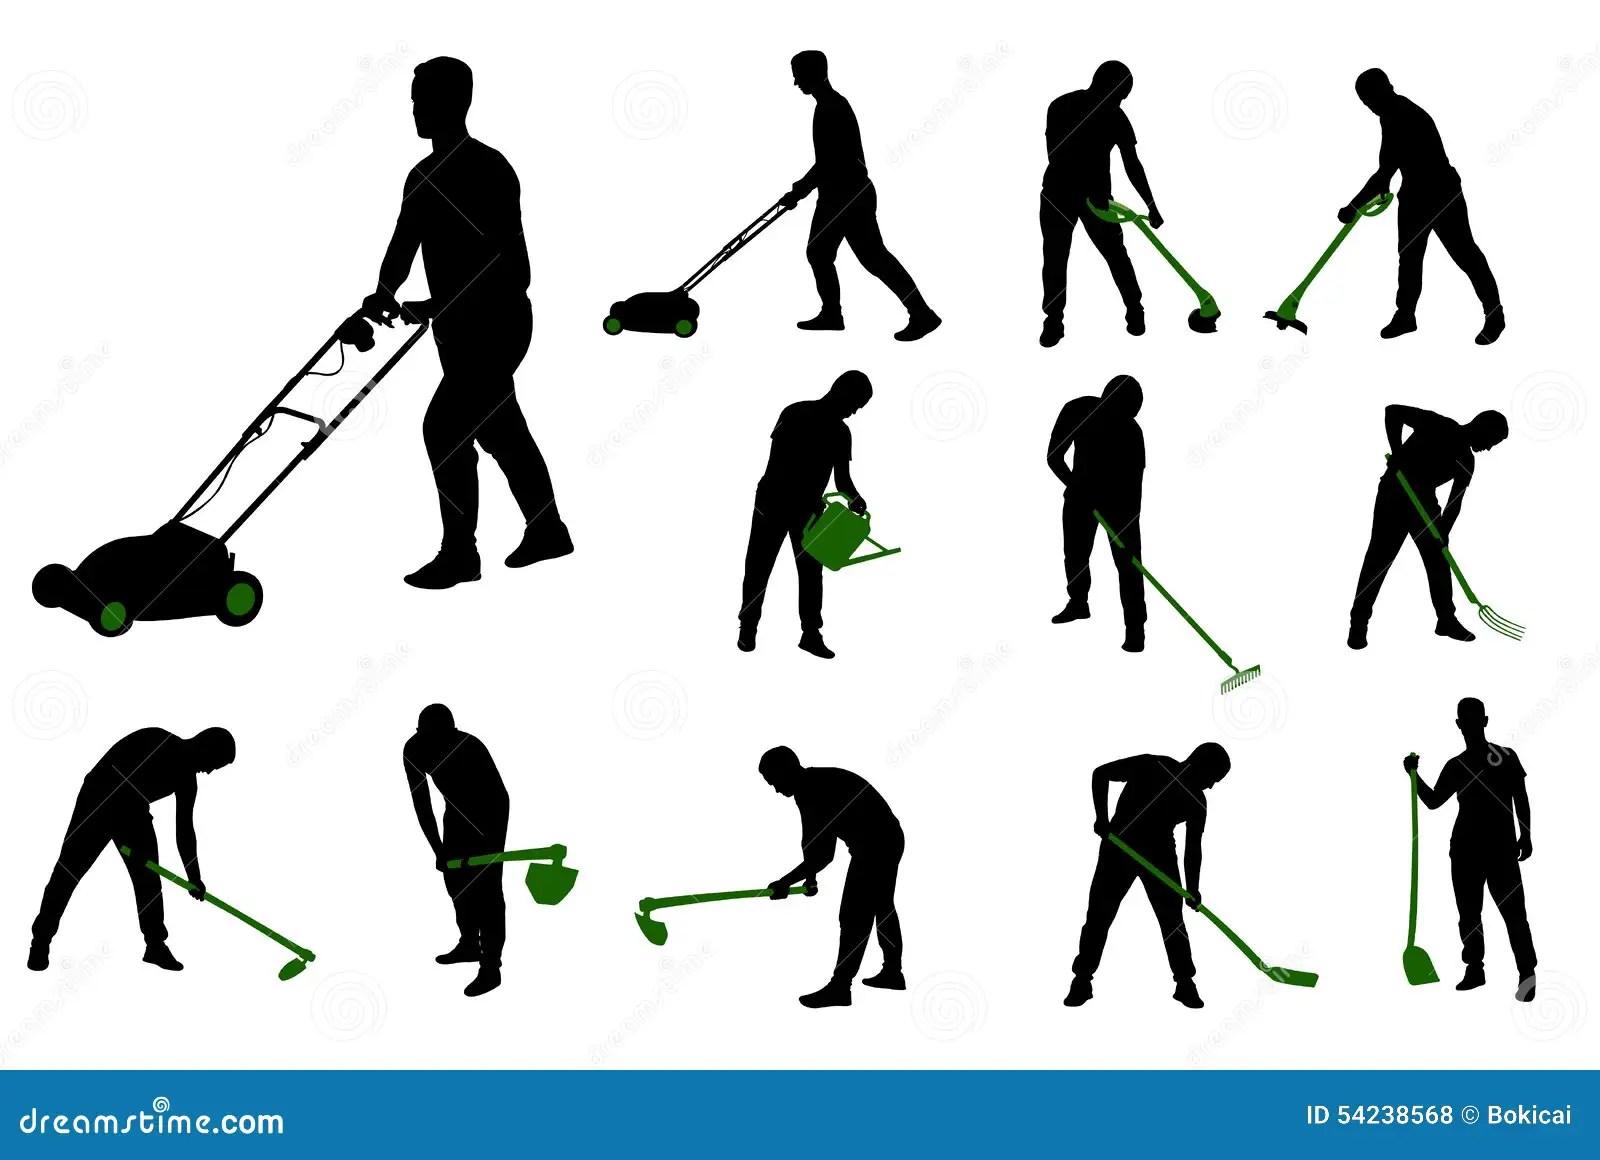 Gardening Work Vector Illustration